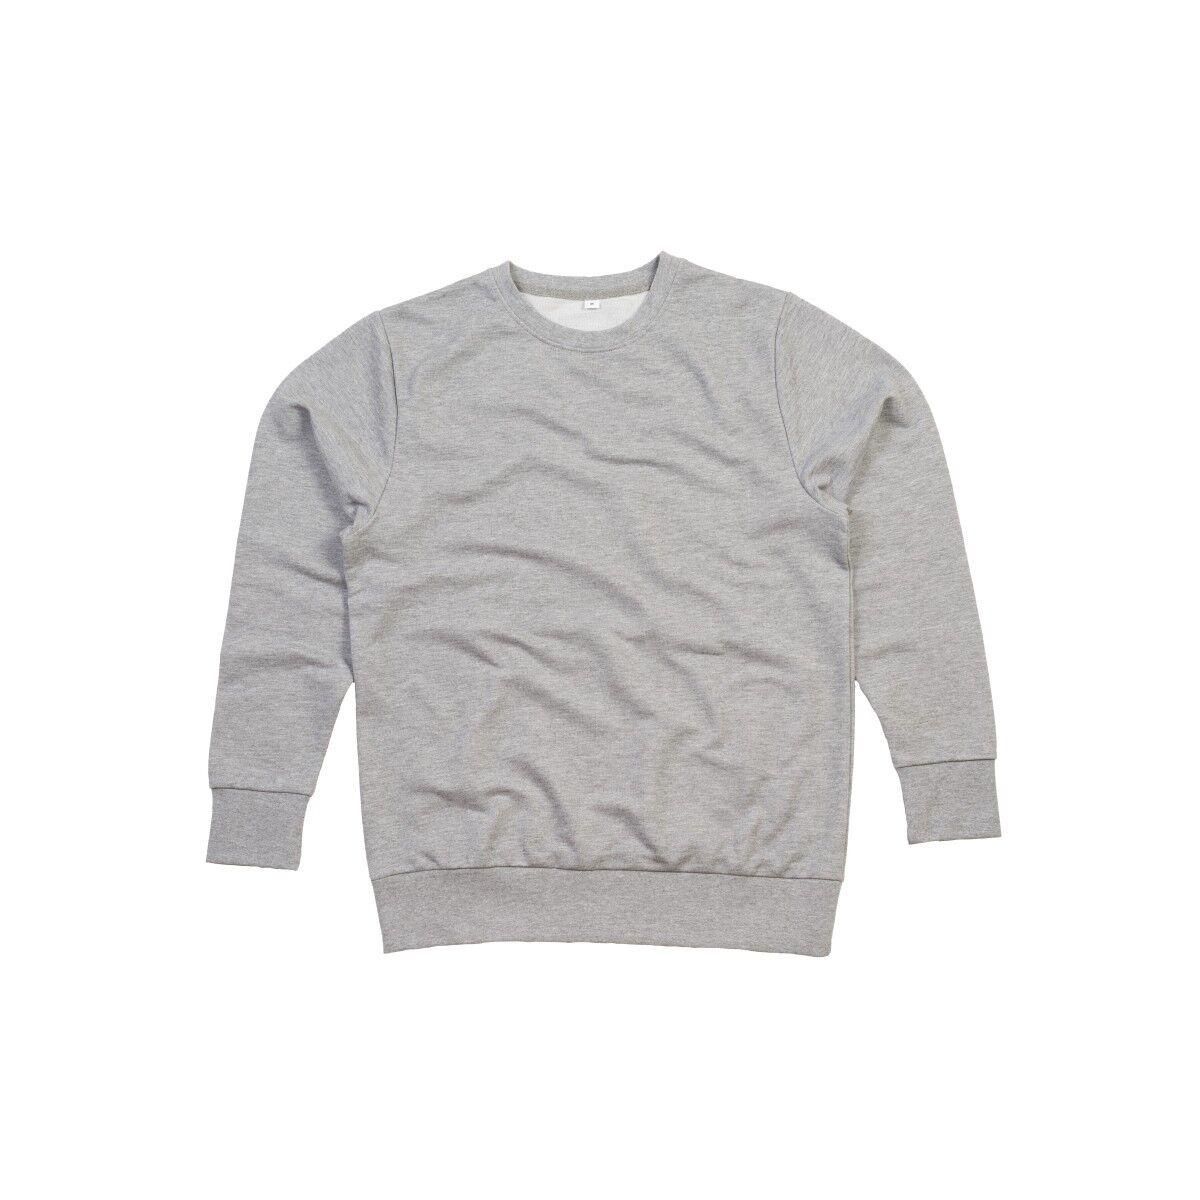 Unisex Mantis Sweatshirt - Heather Grey